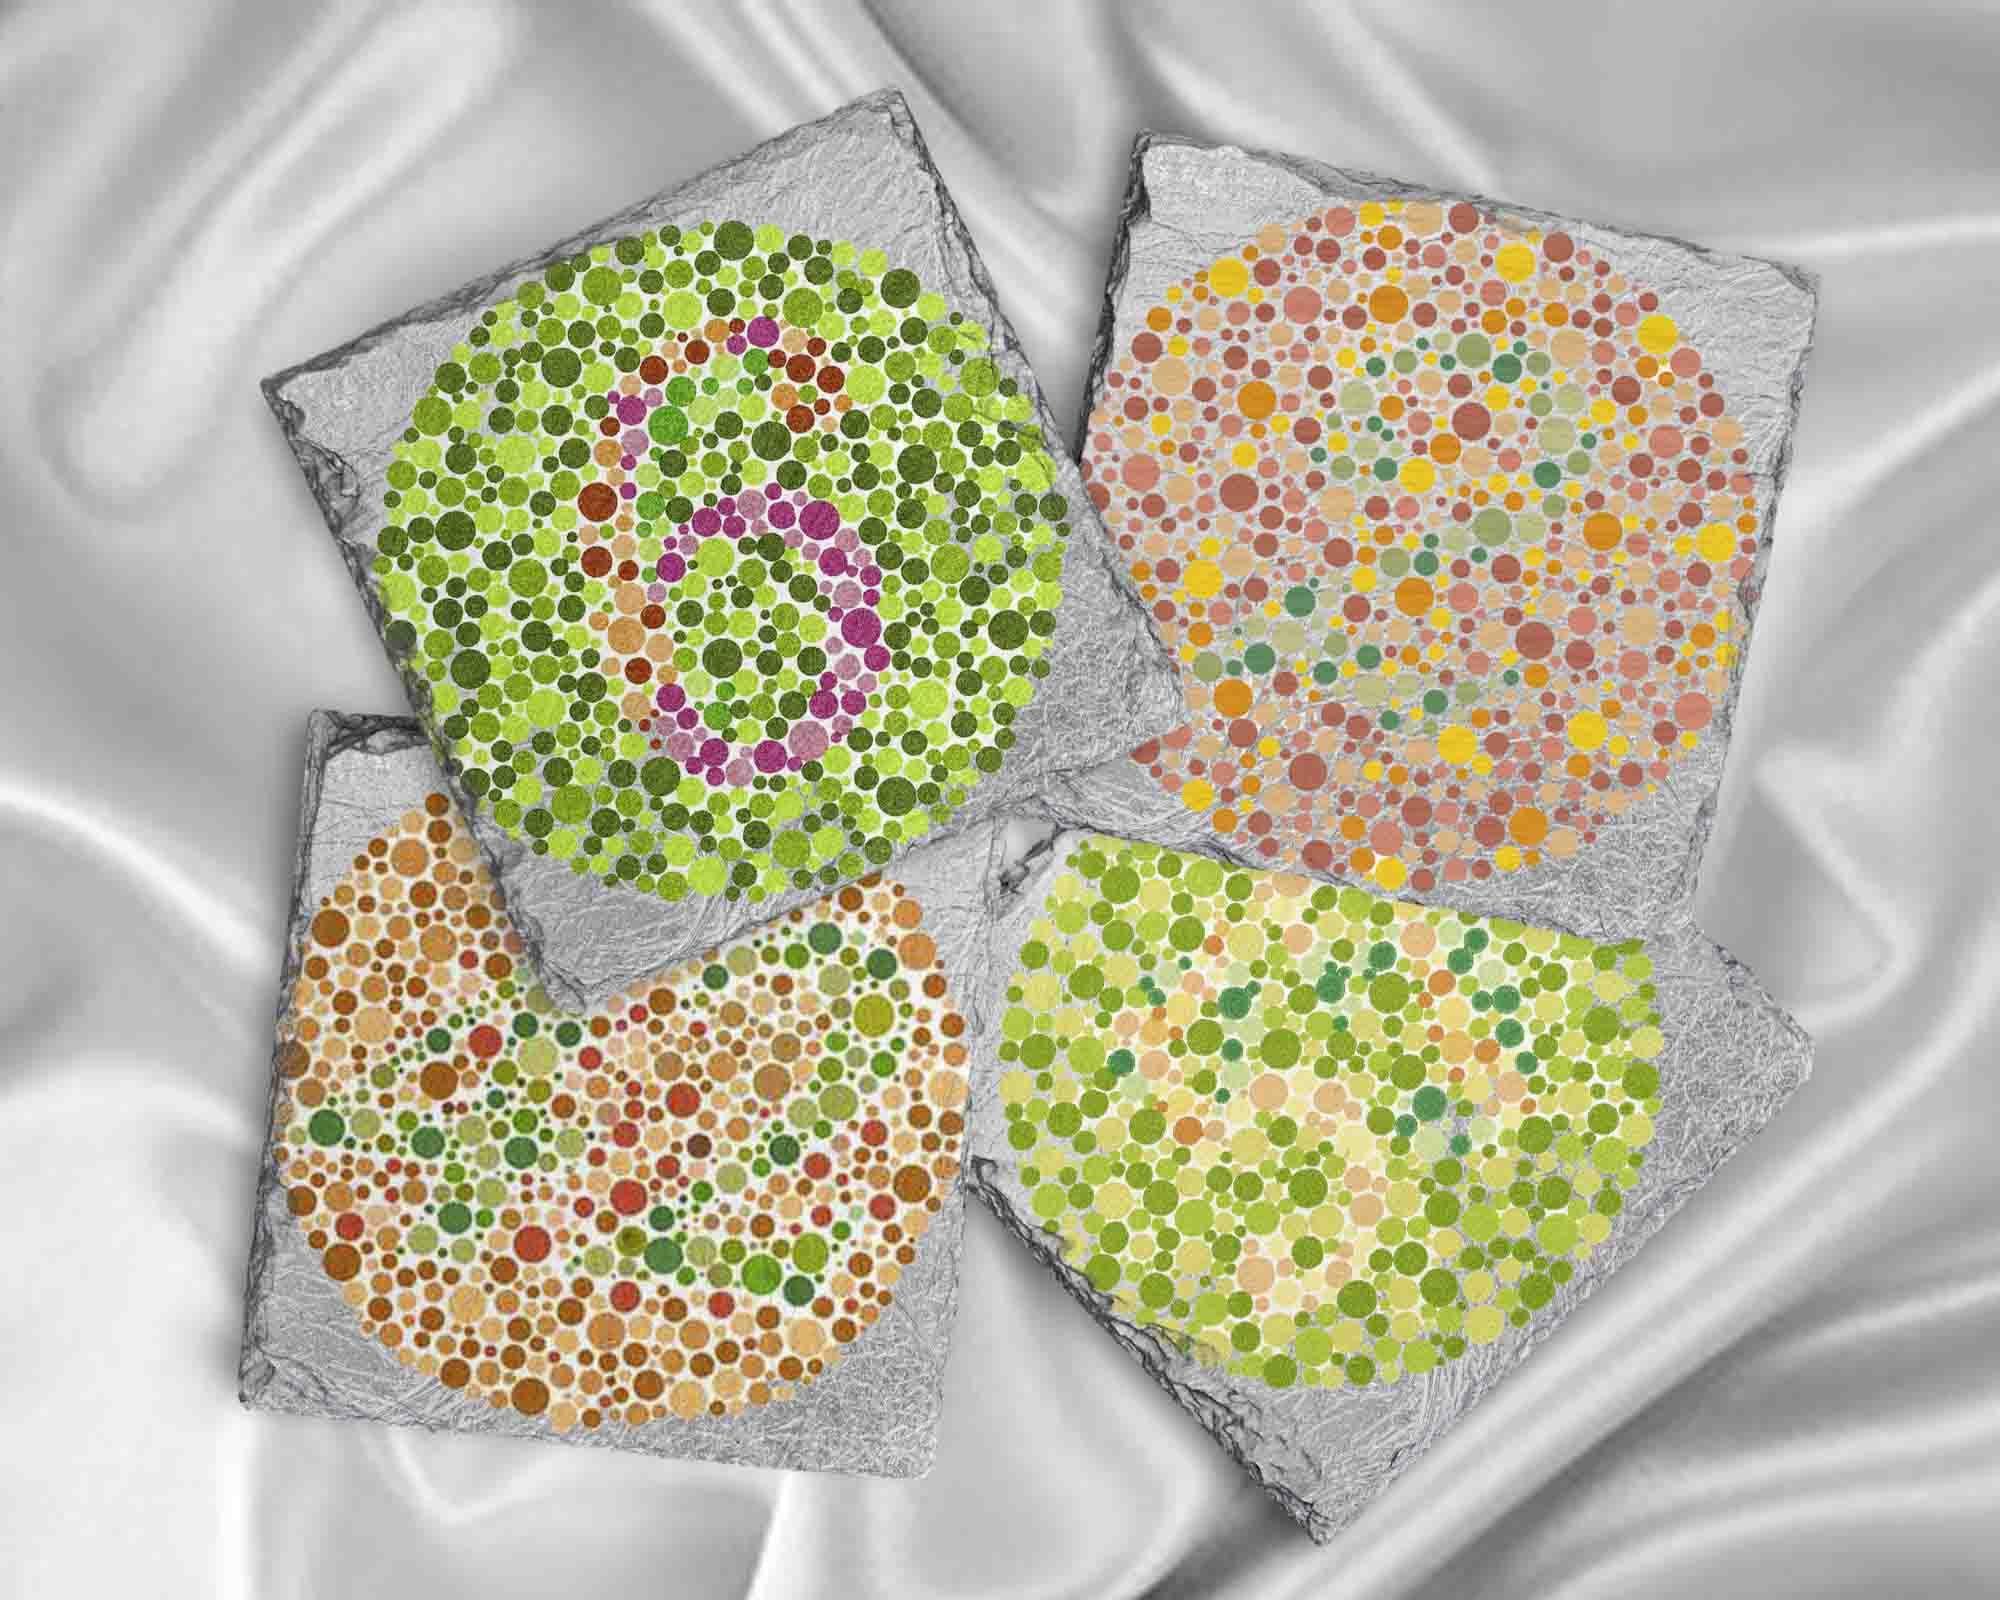 Ophthalmologist Optician Gift Idea, Color Blind Testing Coaster Set ...